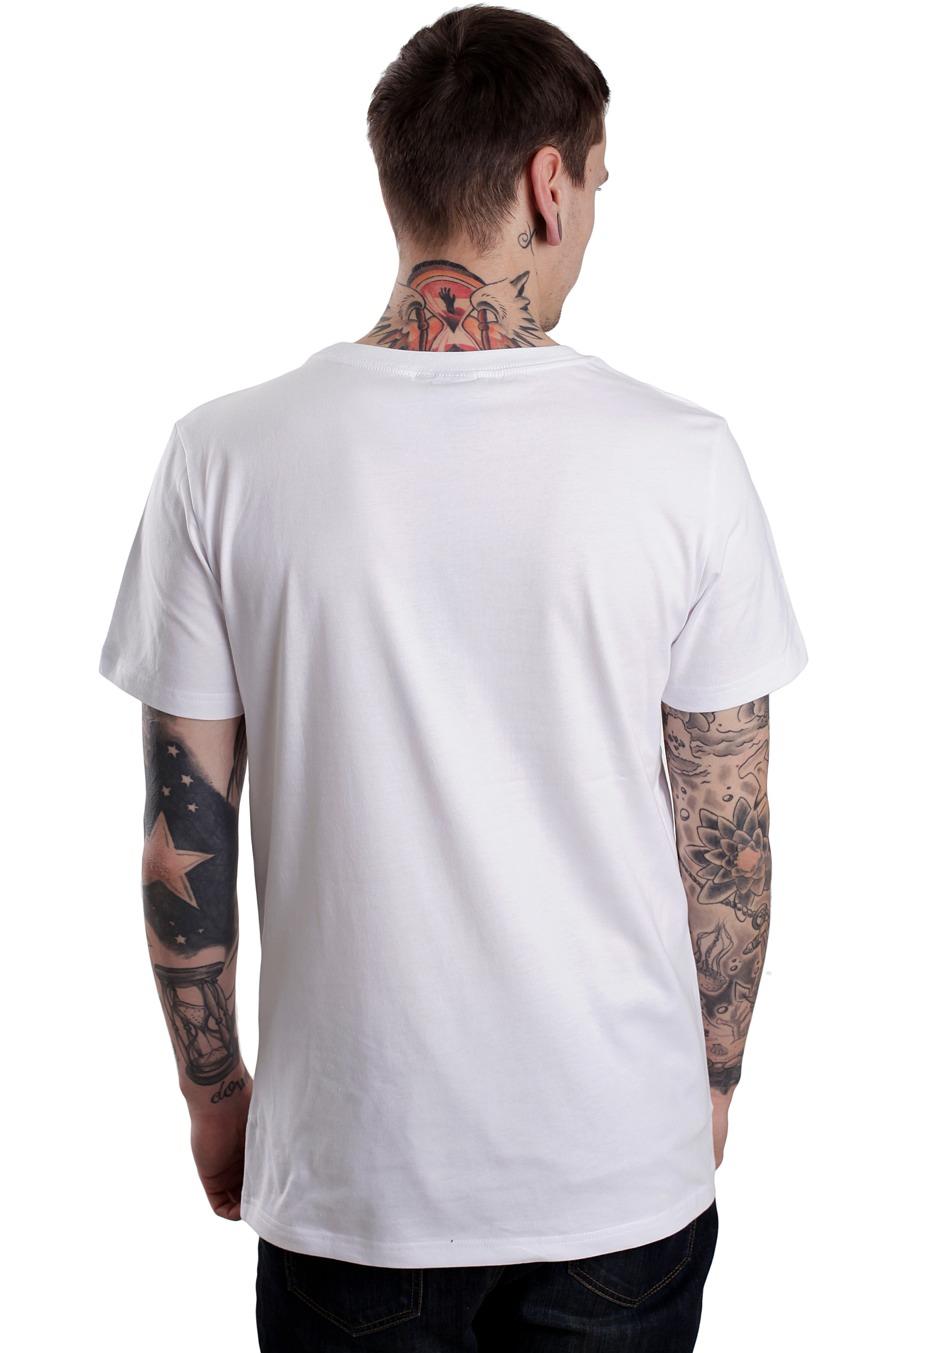 Unite Clothing Stick Tight White T Shirt Streetwear Shop